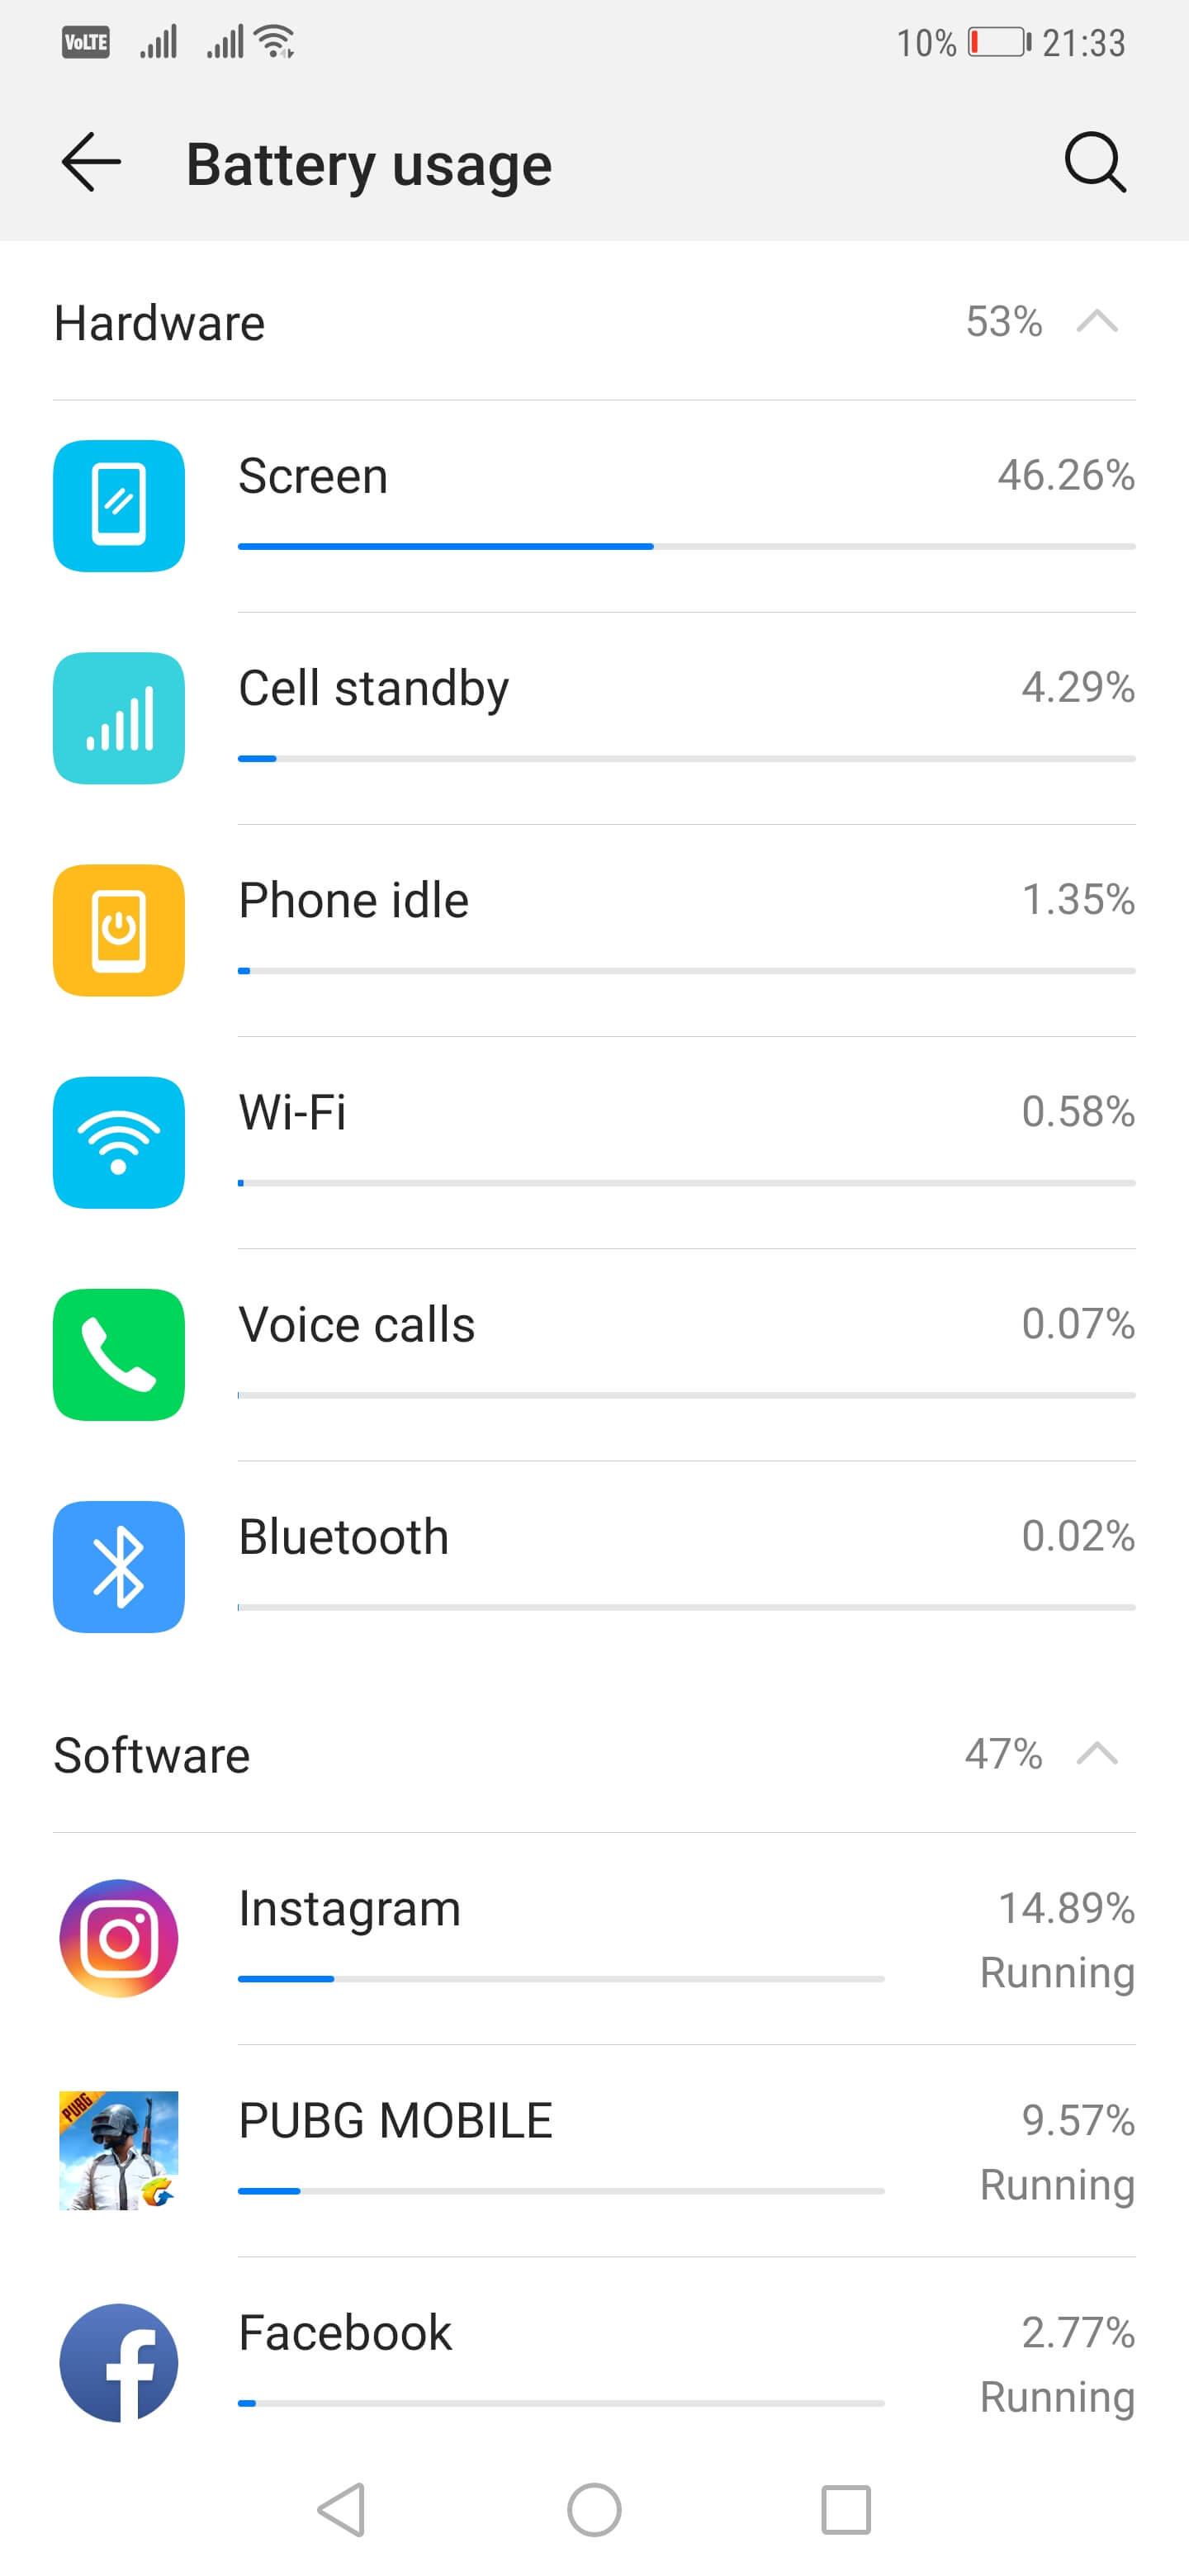 Cat tine bateria pe Huawei Mate 20 Pro - Baterie si autonomie 5